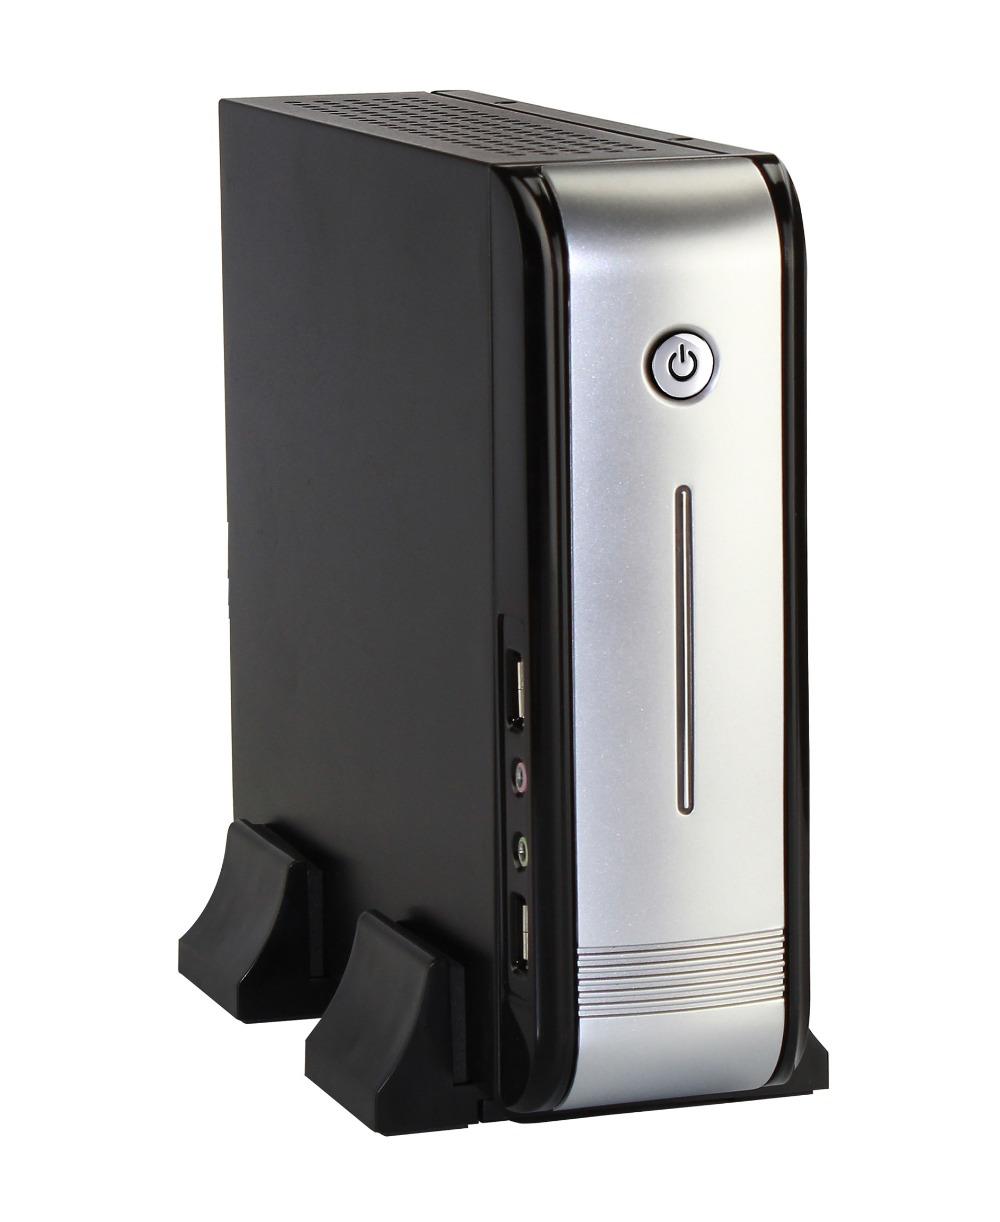 Realan 3015 Mini ITX Commercial Desktop Computer, SGCC Office Computer, Cheap Desktop PC Case without power supply(China (Mainland))